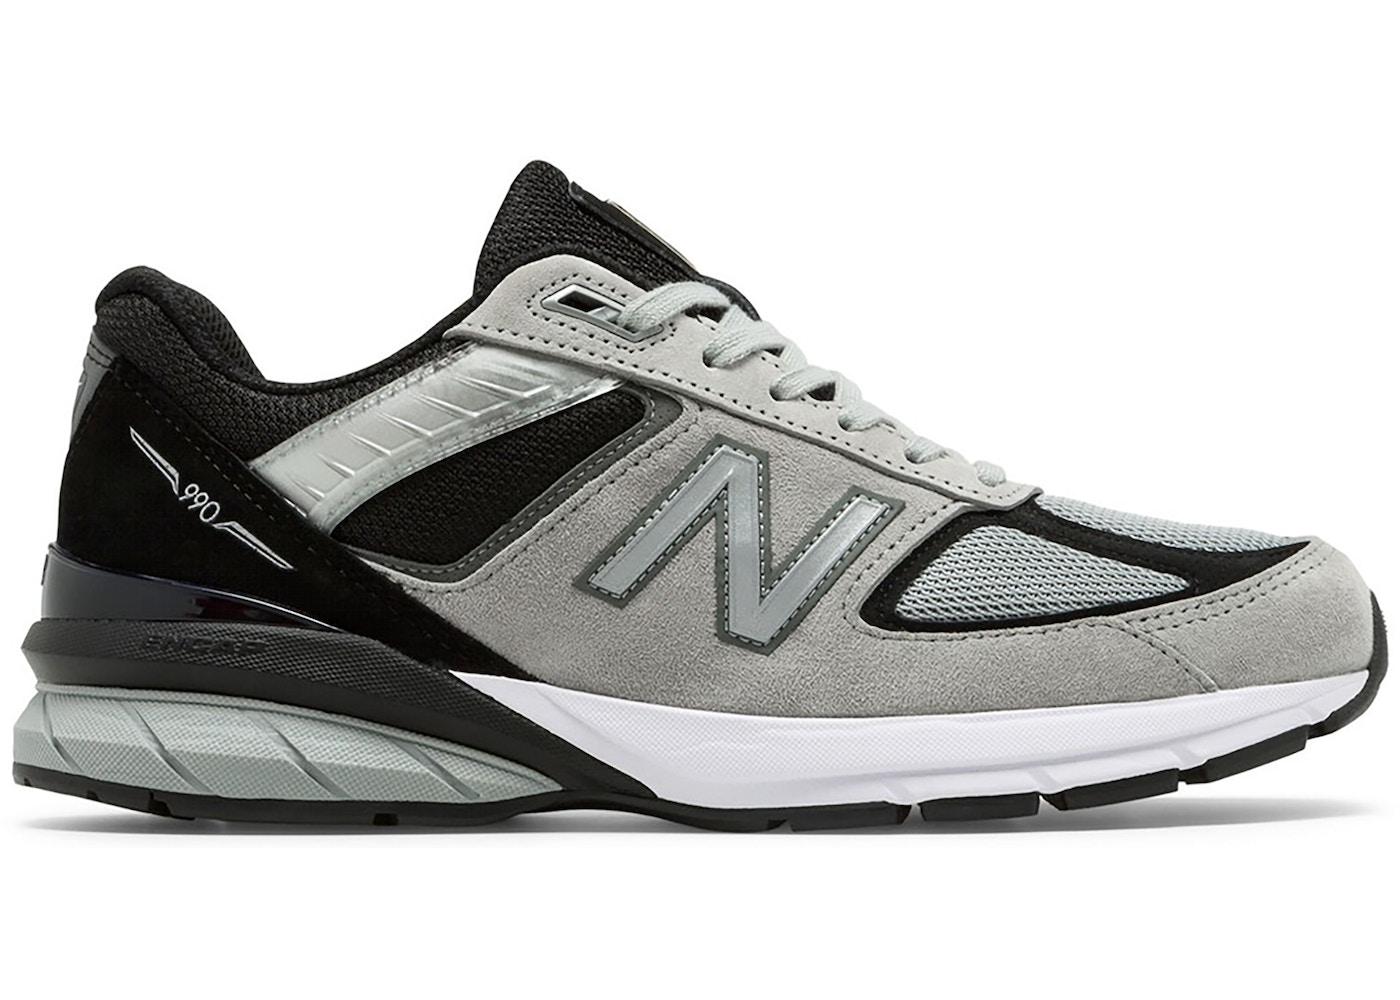 New Balance 990v5 Kool Grey Black